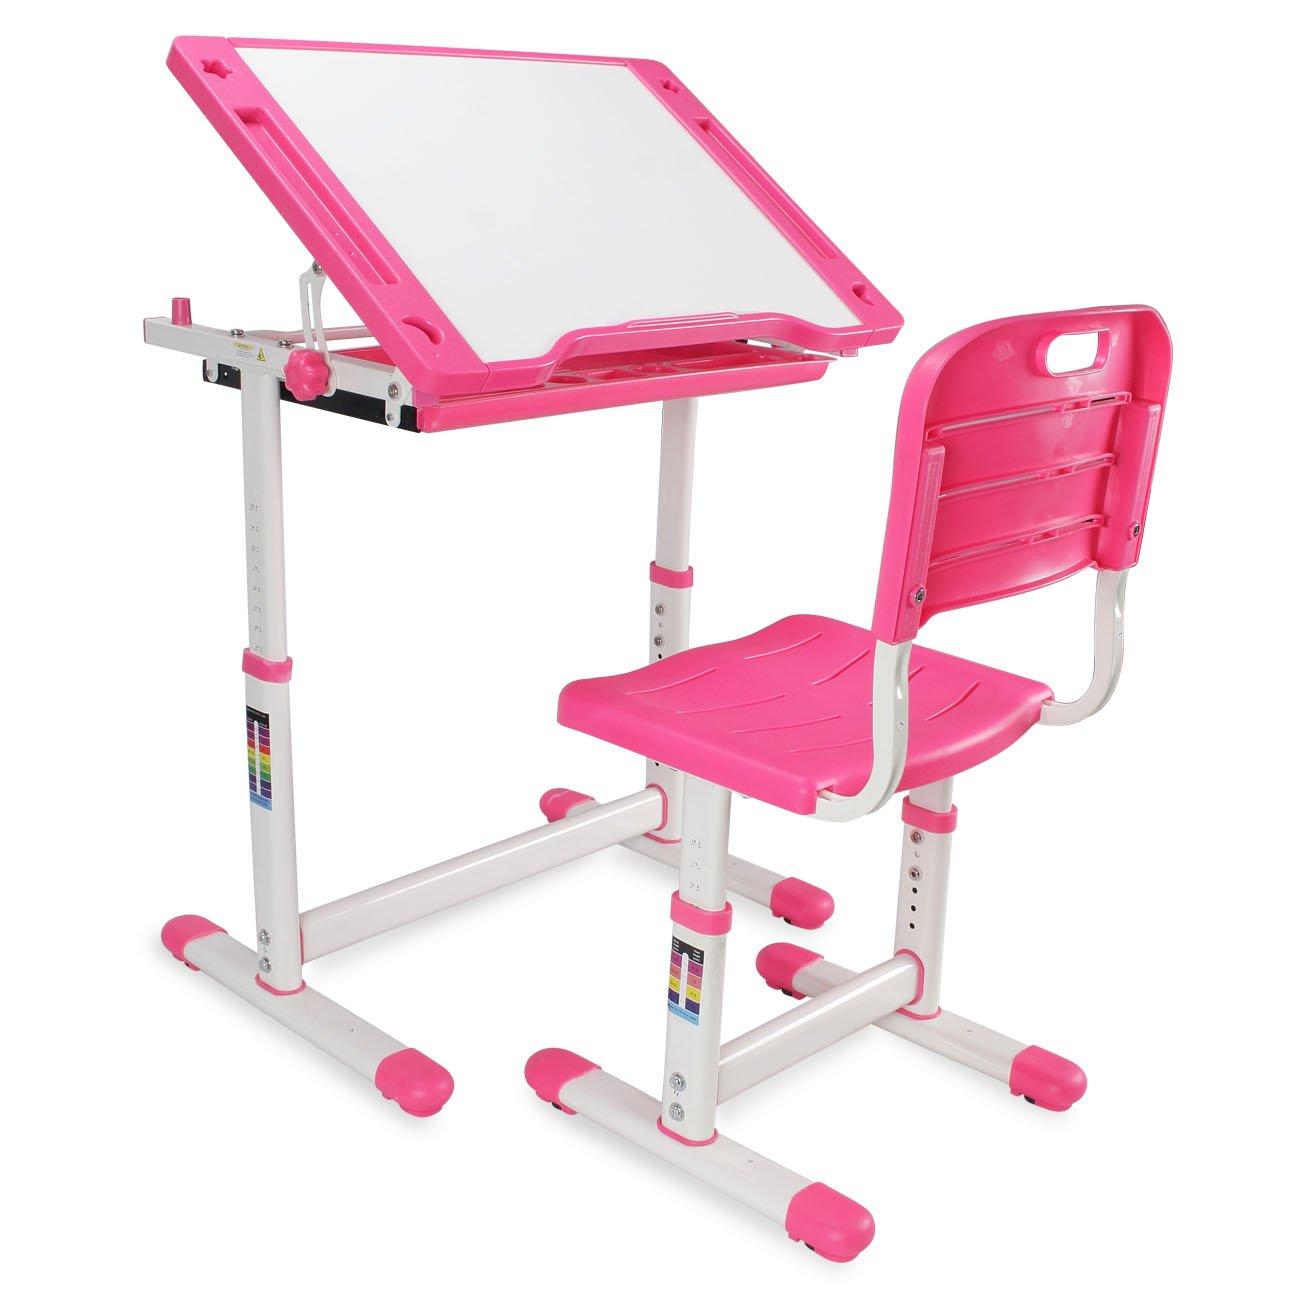 Kidzone Adjustable Children's Desk & Chair Set Kids Study Table Set Tiltable Desktop Height Work Station w/ Pull Out Drawer, Pink